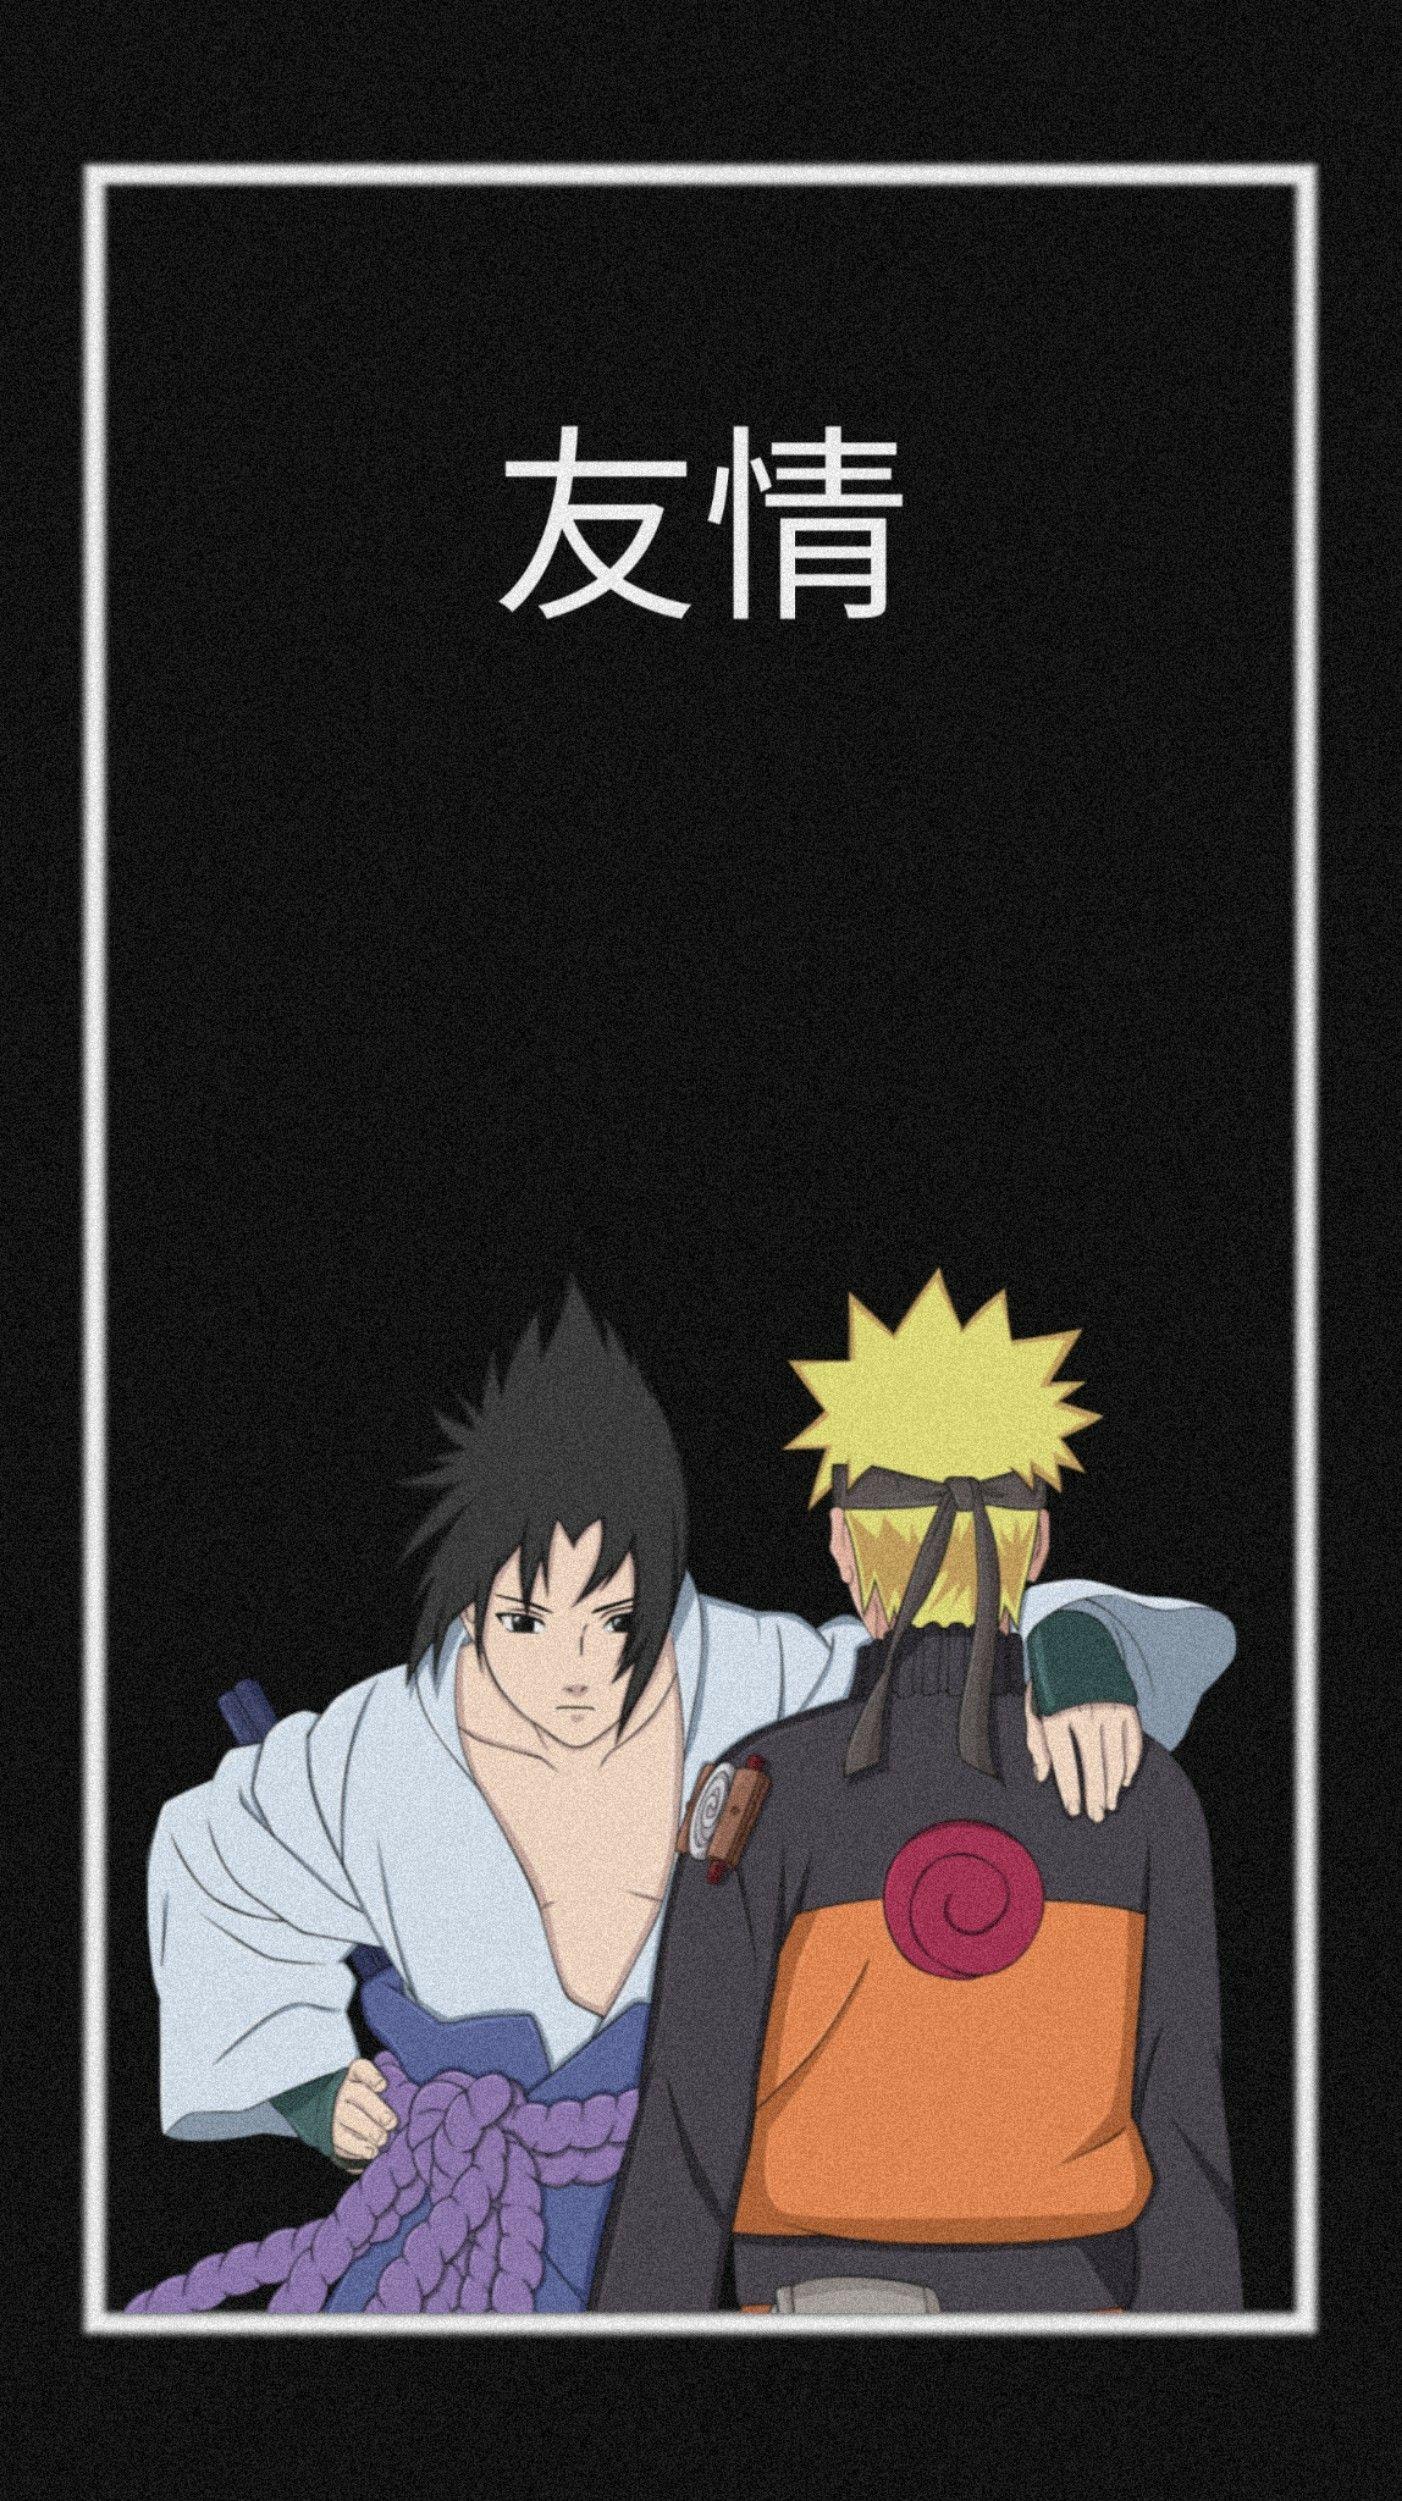 Naruto Sasuke Wallpaper Hd Instagram Vargz7 Naruto And Sasuke Wallpaper Naruto Art Wallpaper Naruto Shippuden